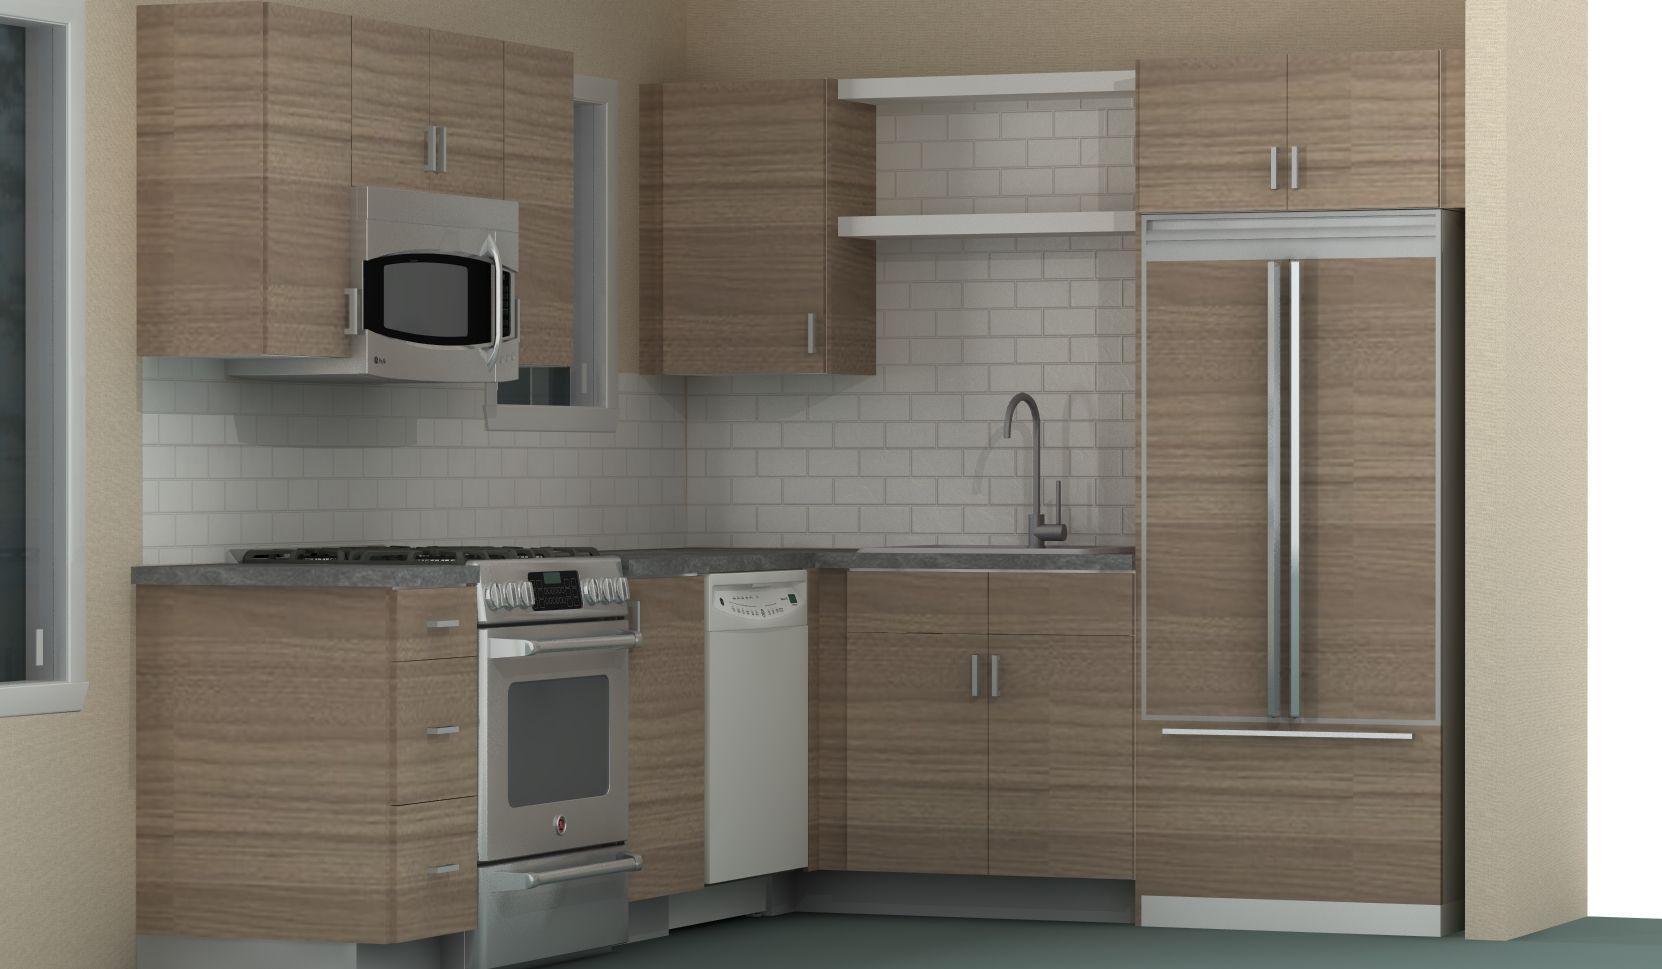 Best Ikea Has Door Fronts For Integrated Appliances This Is 640 x 480